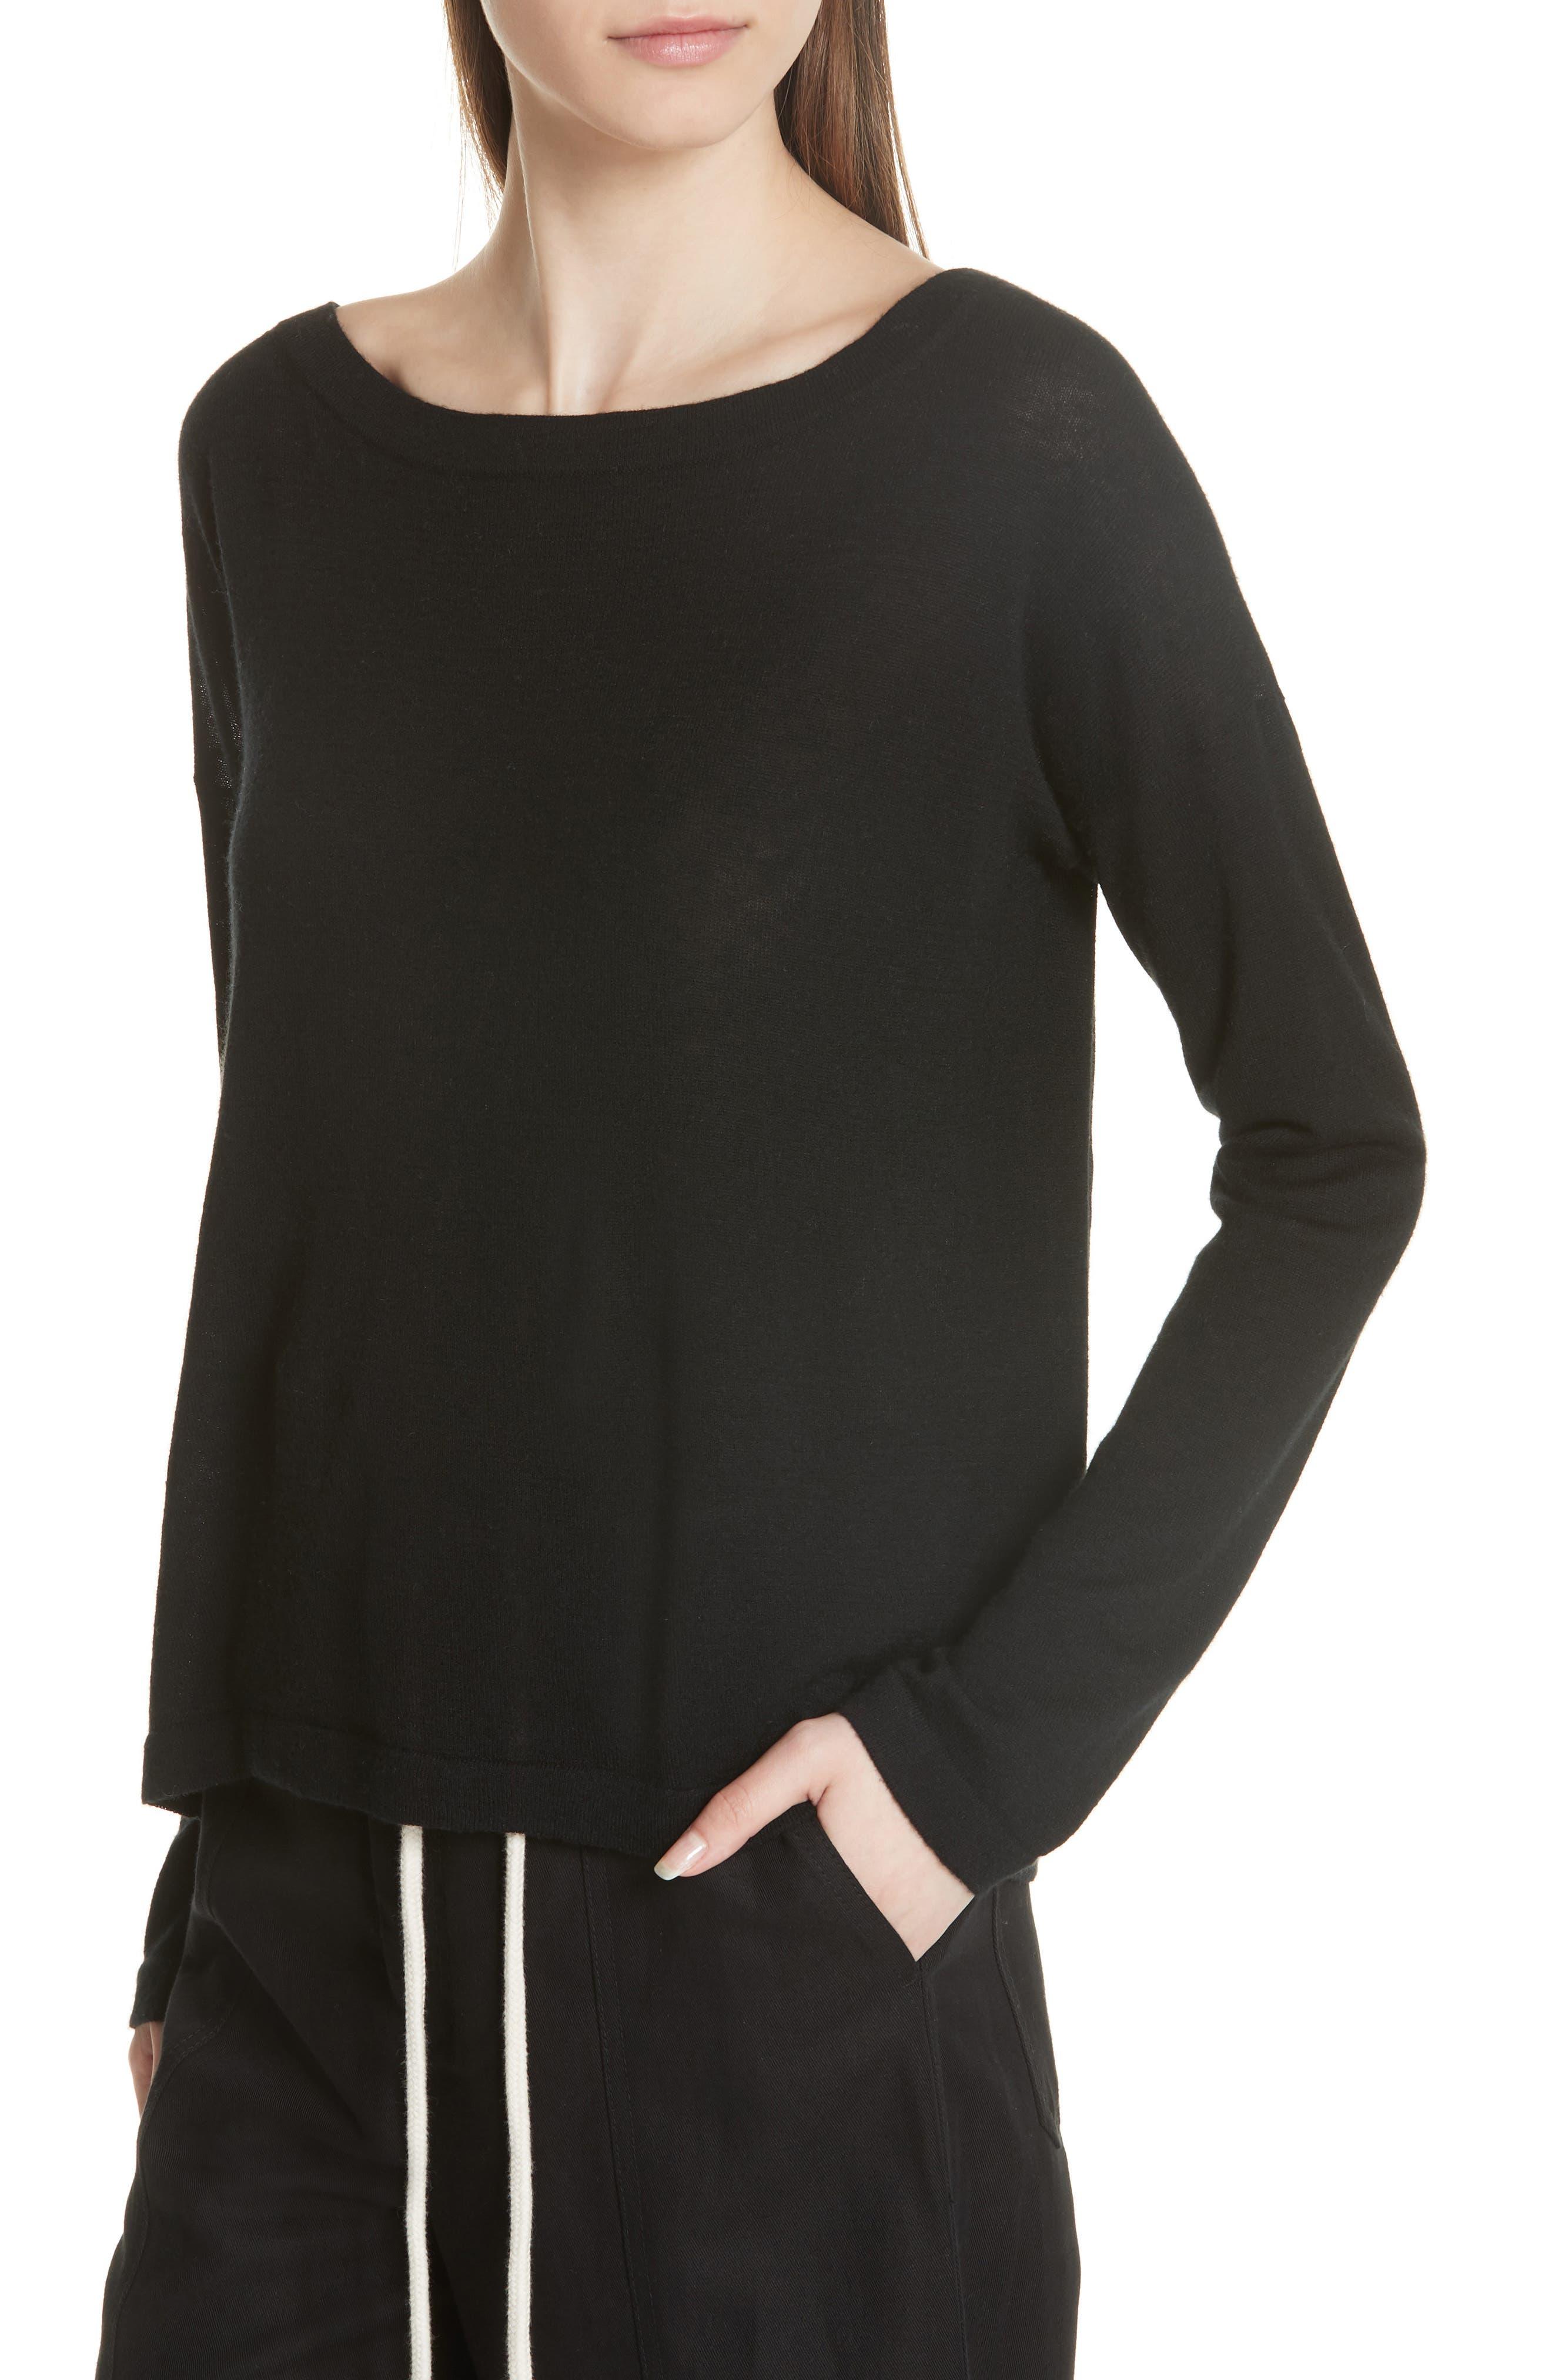 Cinched Back Cashmere Sweater,                             Alternate thumbnail 4, color,                             Black